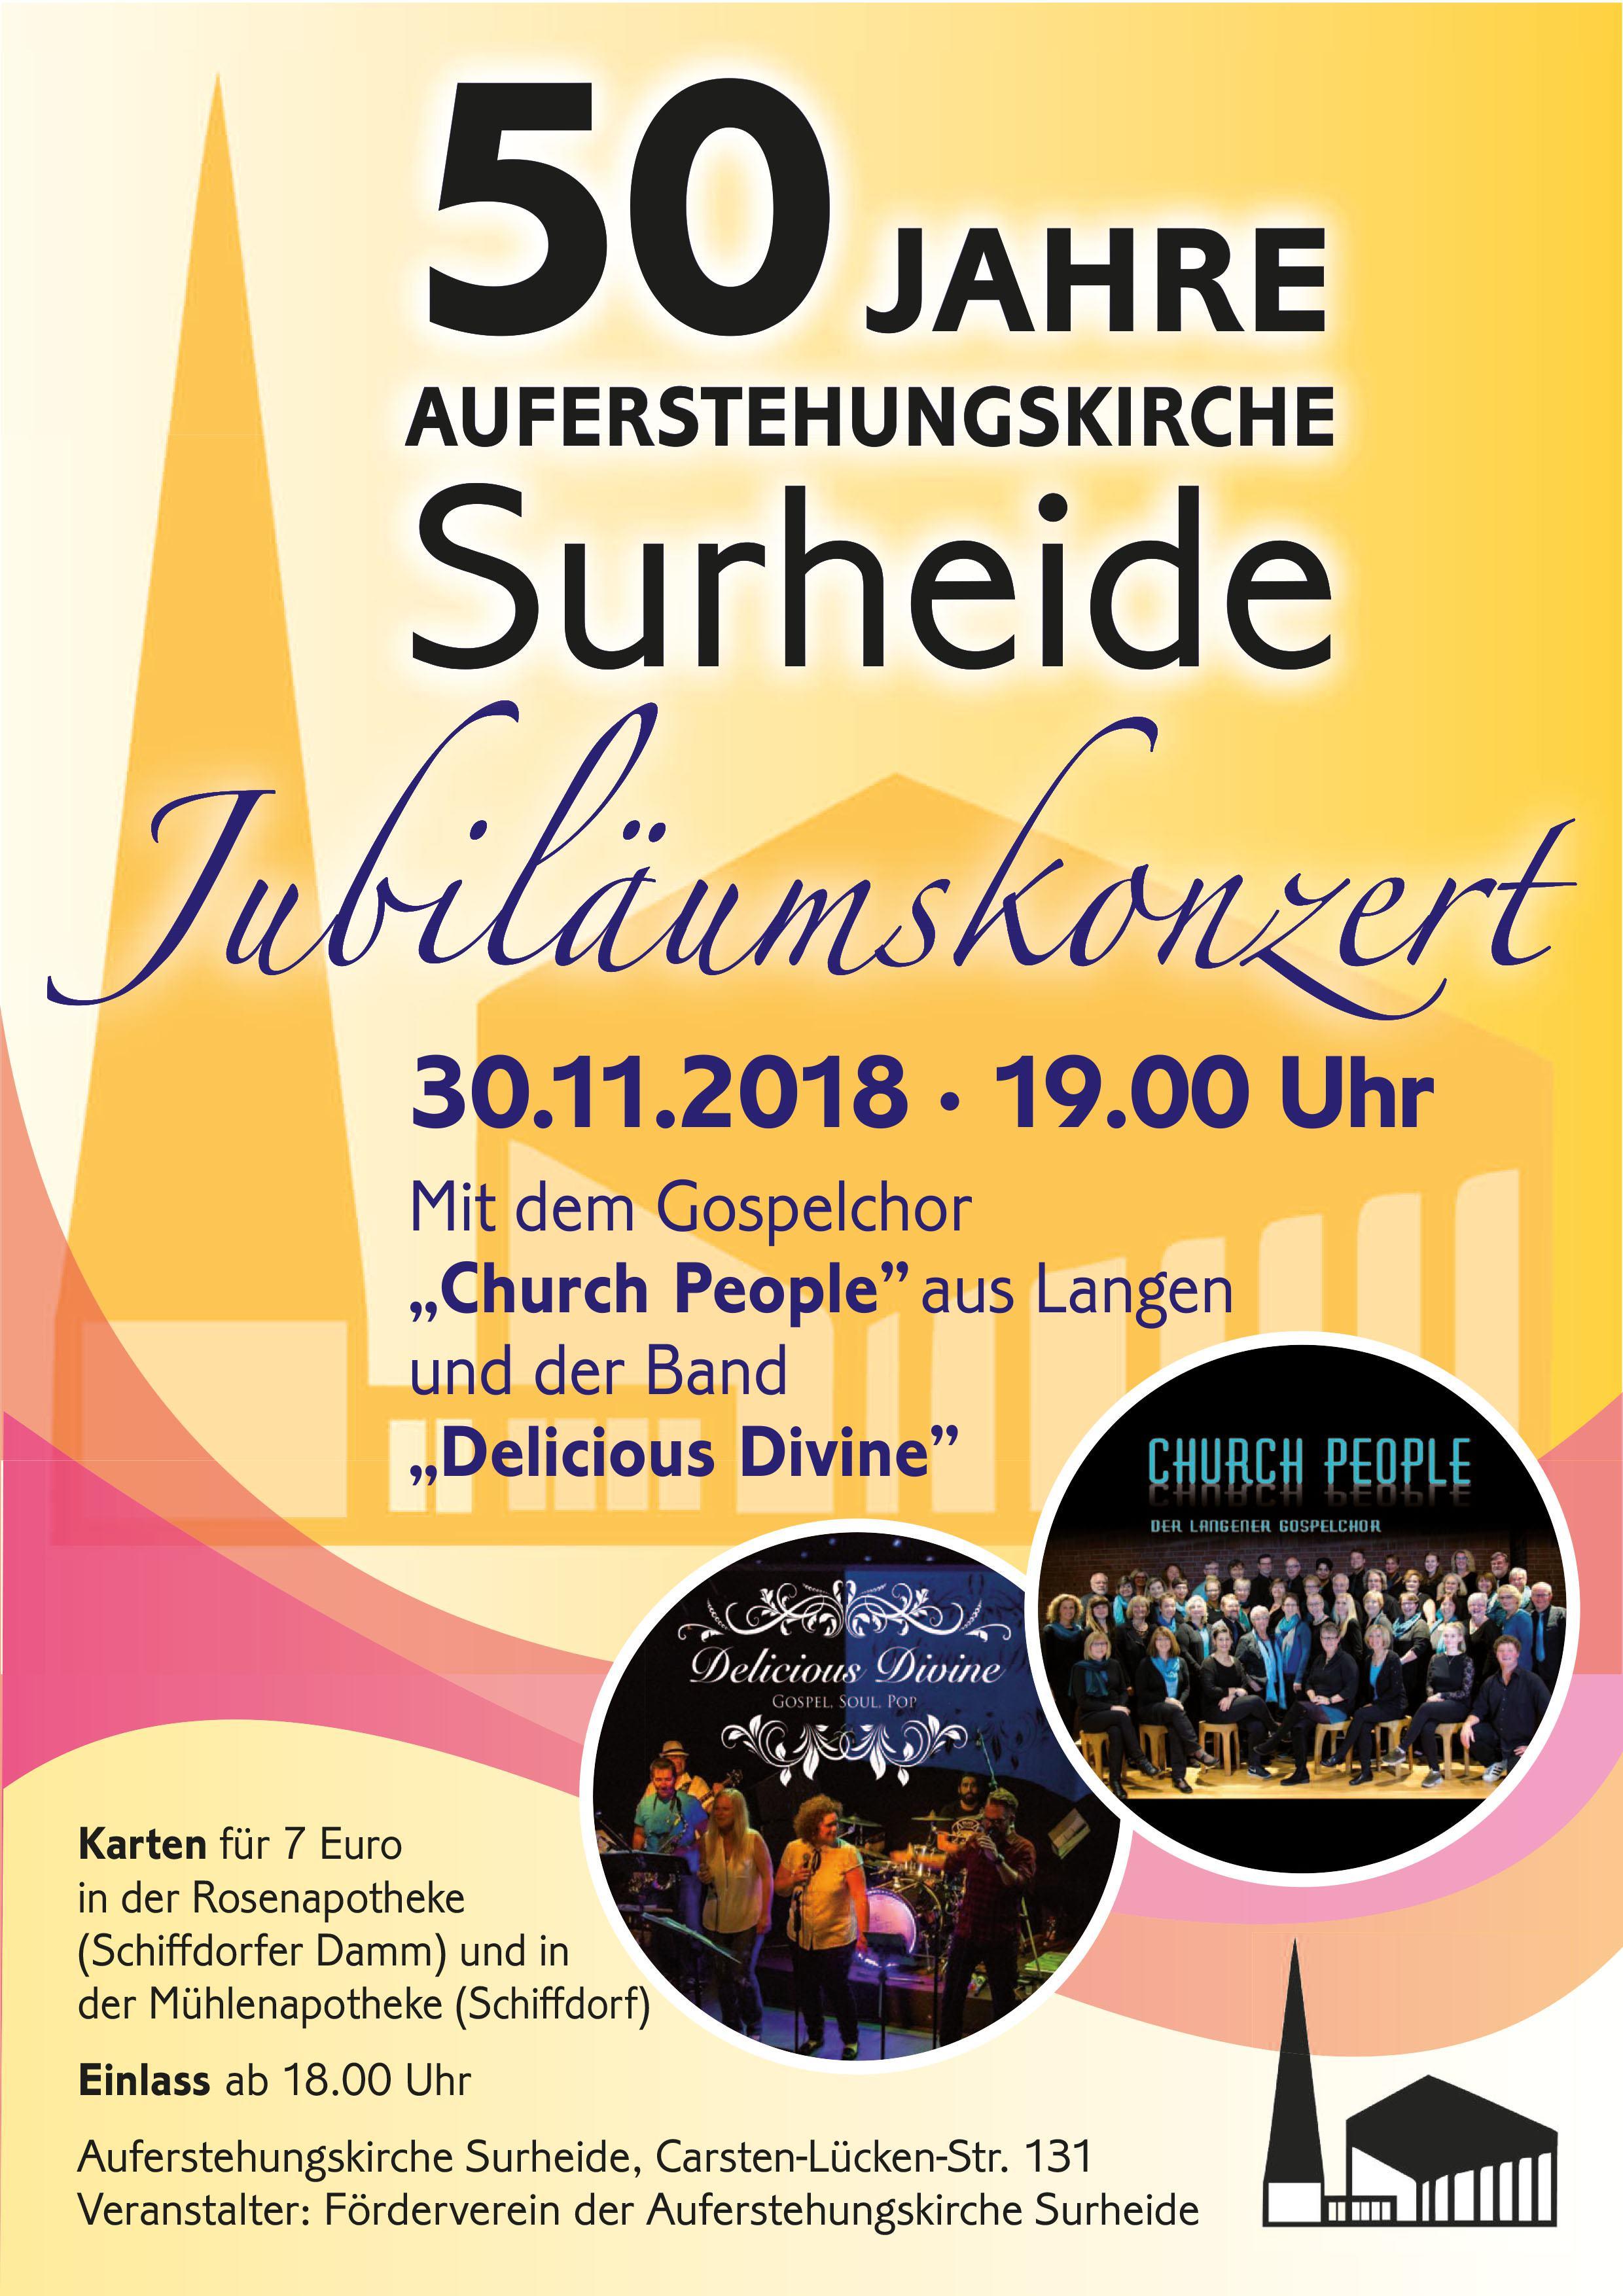 Jubiläumskonzert am 30.11.2018 in der Surheider Kirche